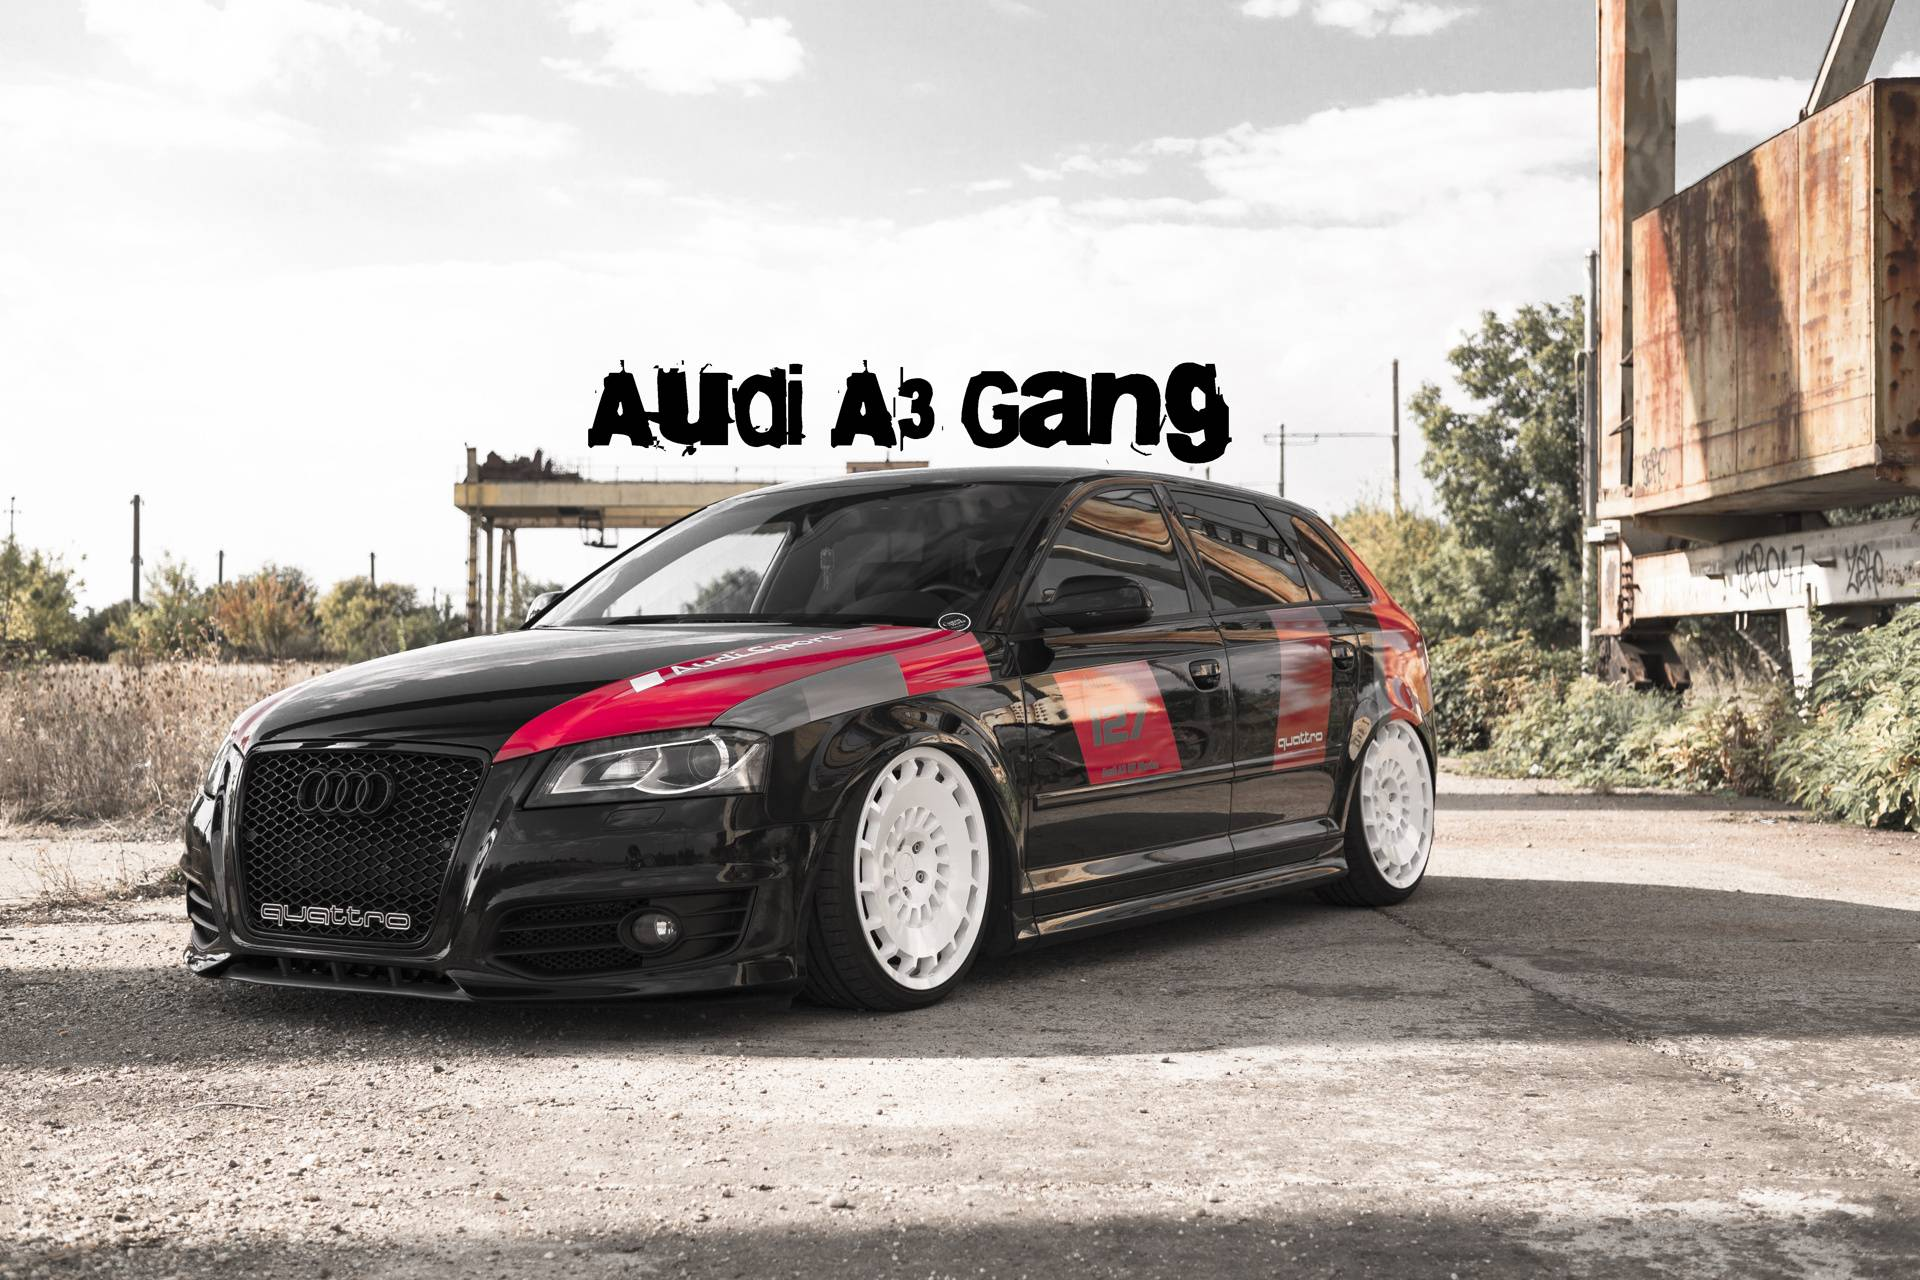 AUDI S3 GANG LOW